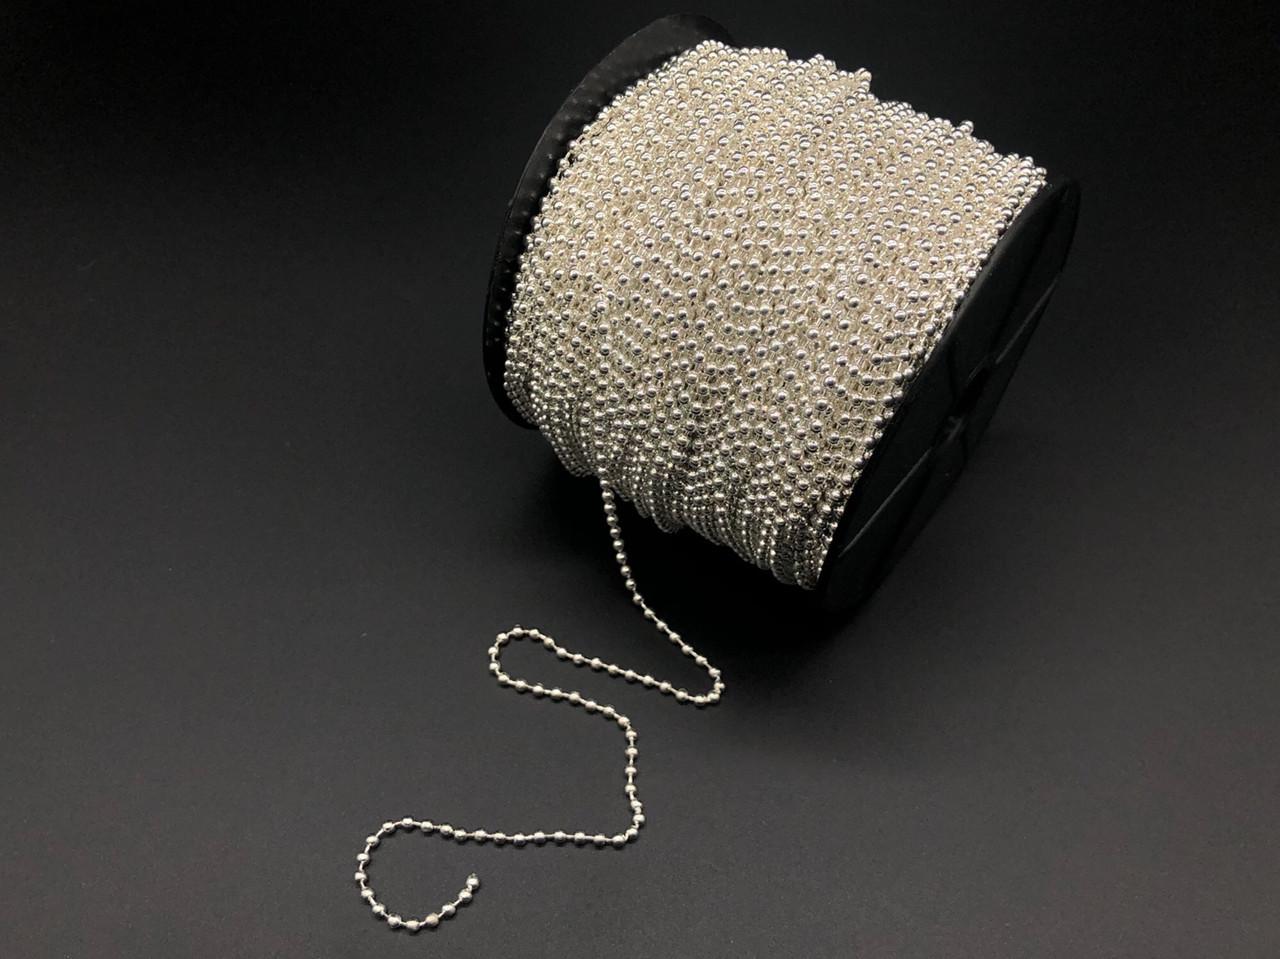 Цепочка шариковая. Светлое серебро. 2.4мм